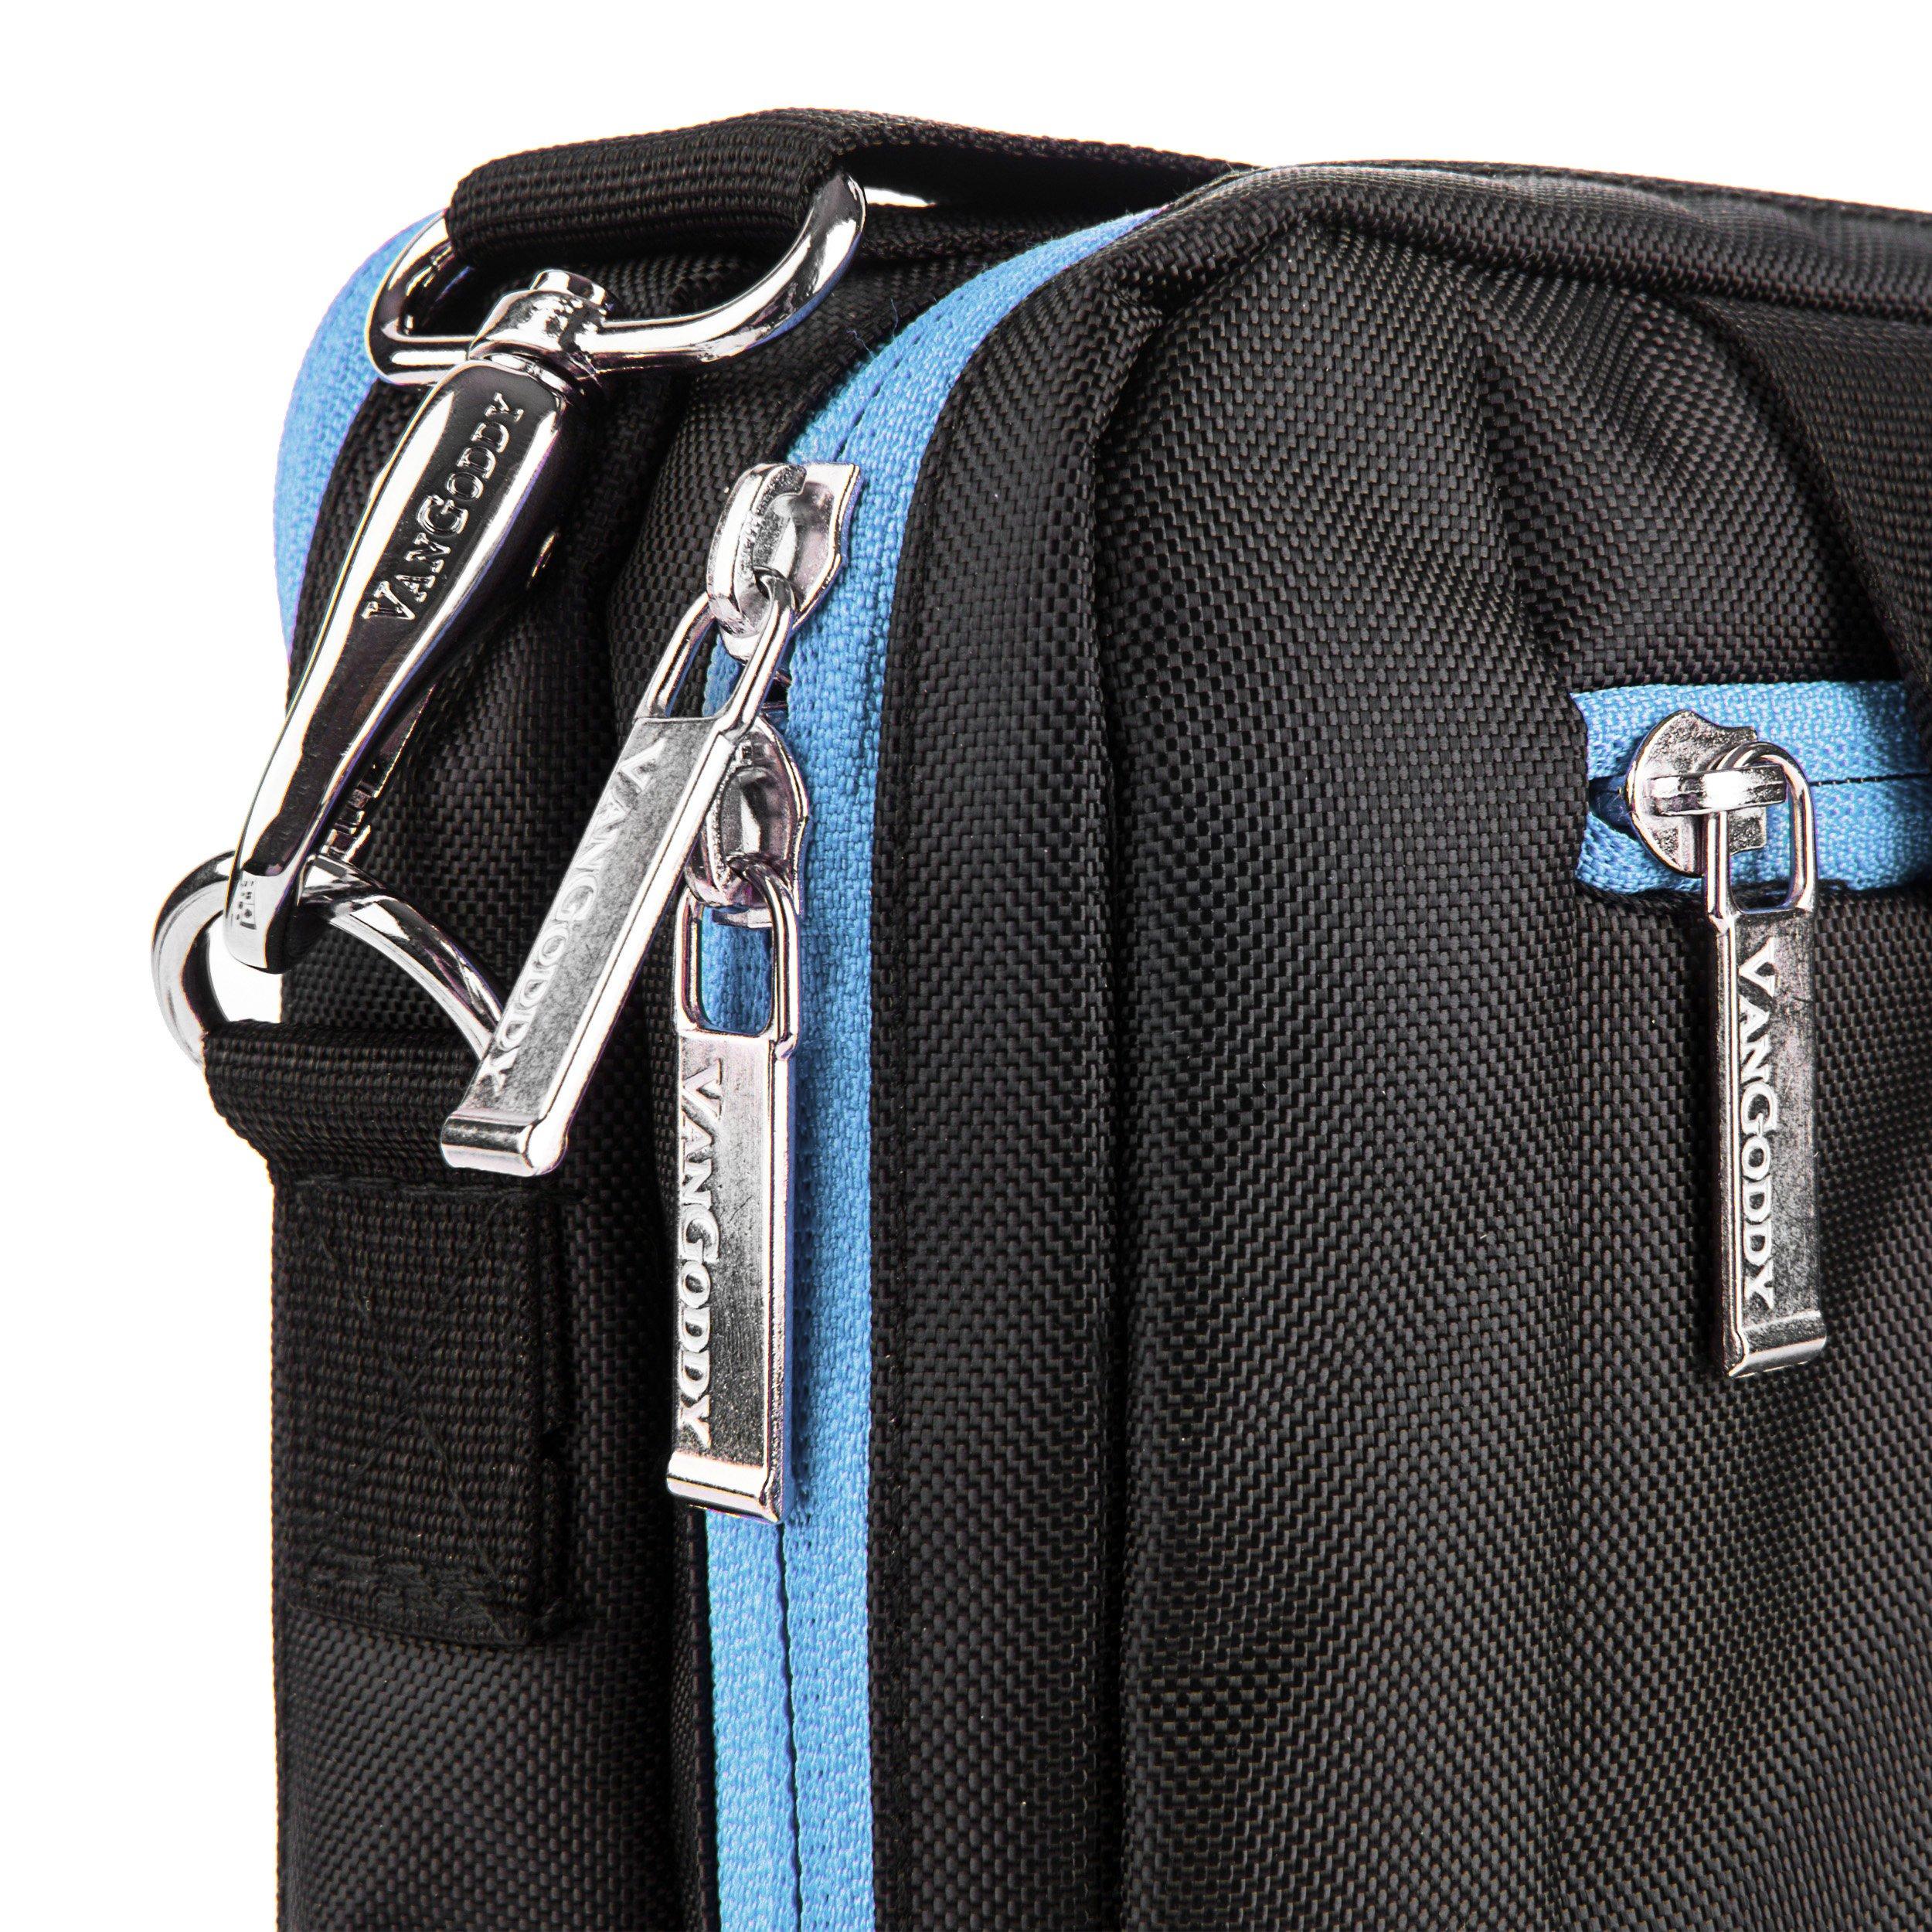 Messenger Aqua Bag & Wireless USB Mouse for Lenovo & Samsung Tablet / Laptops / 2 in 1s by Vangoddy